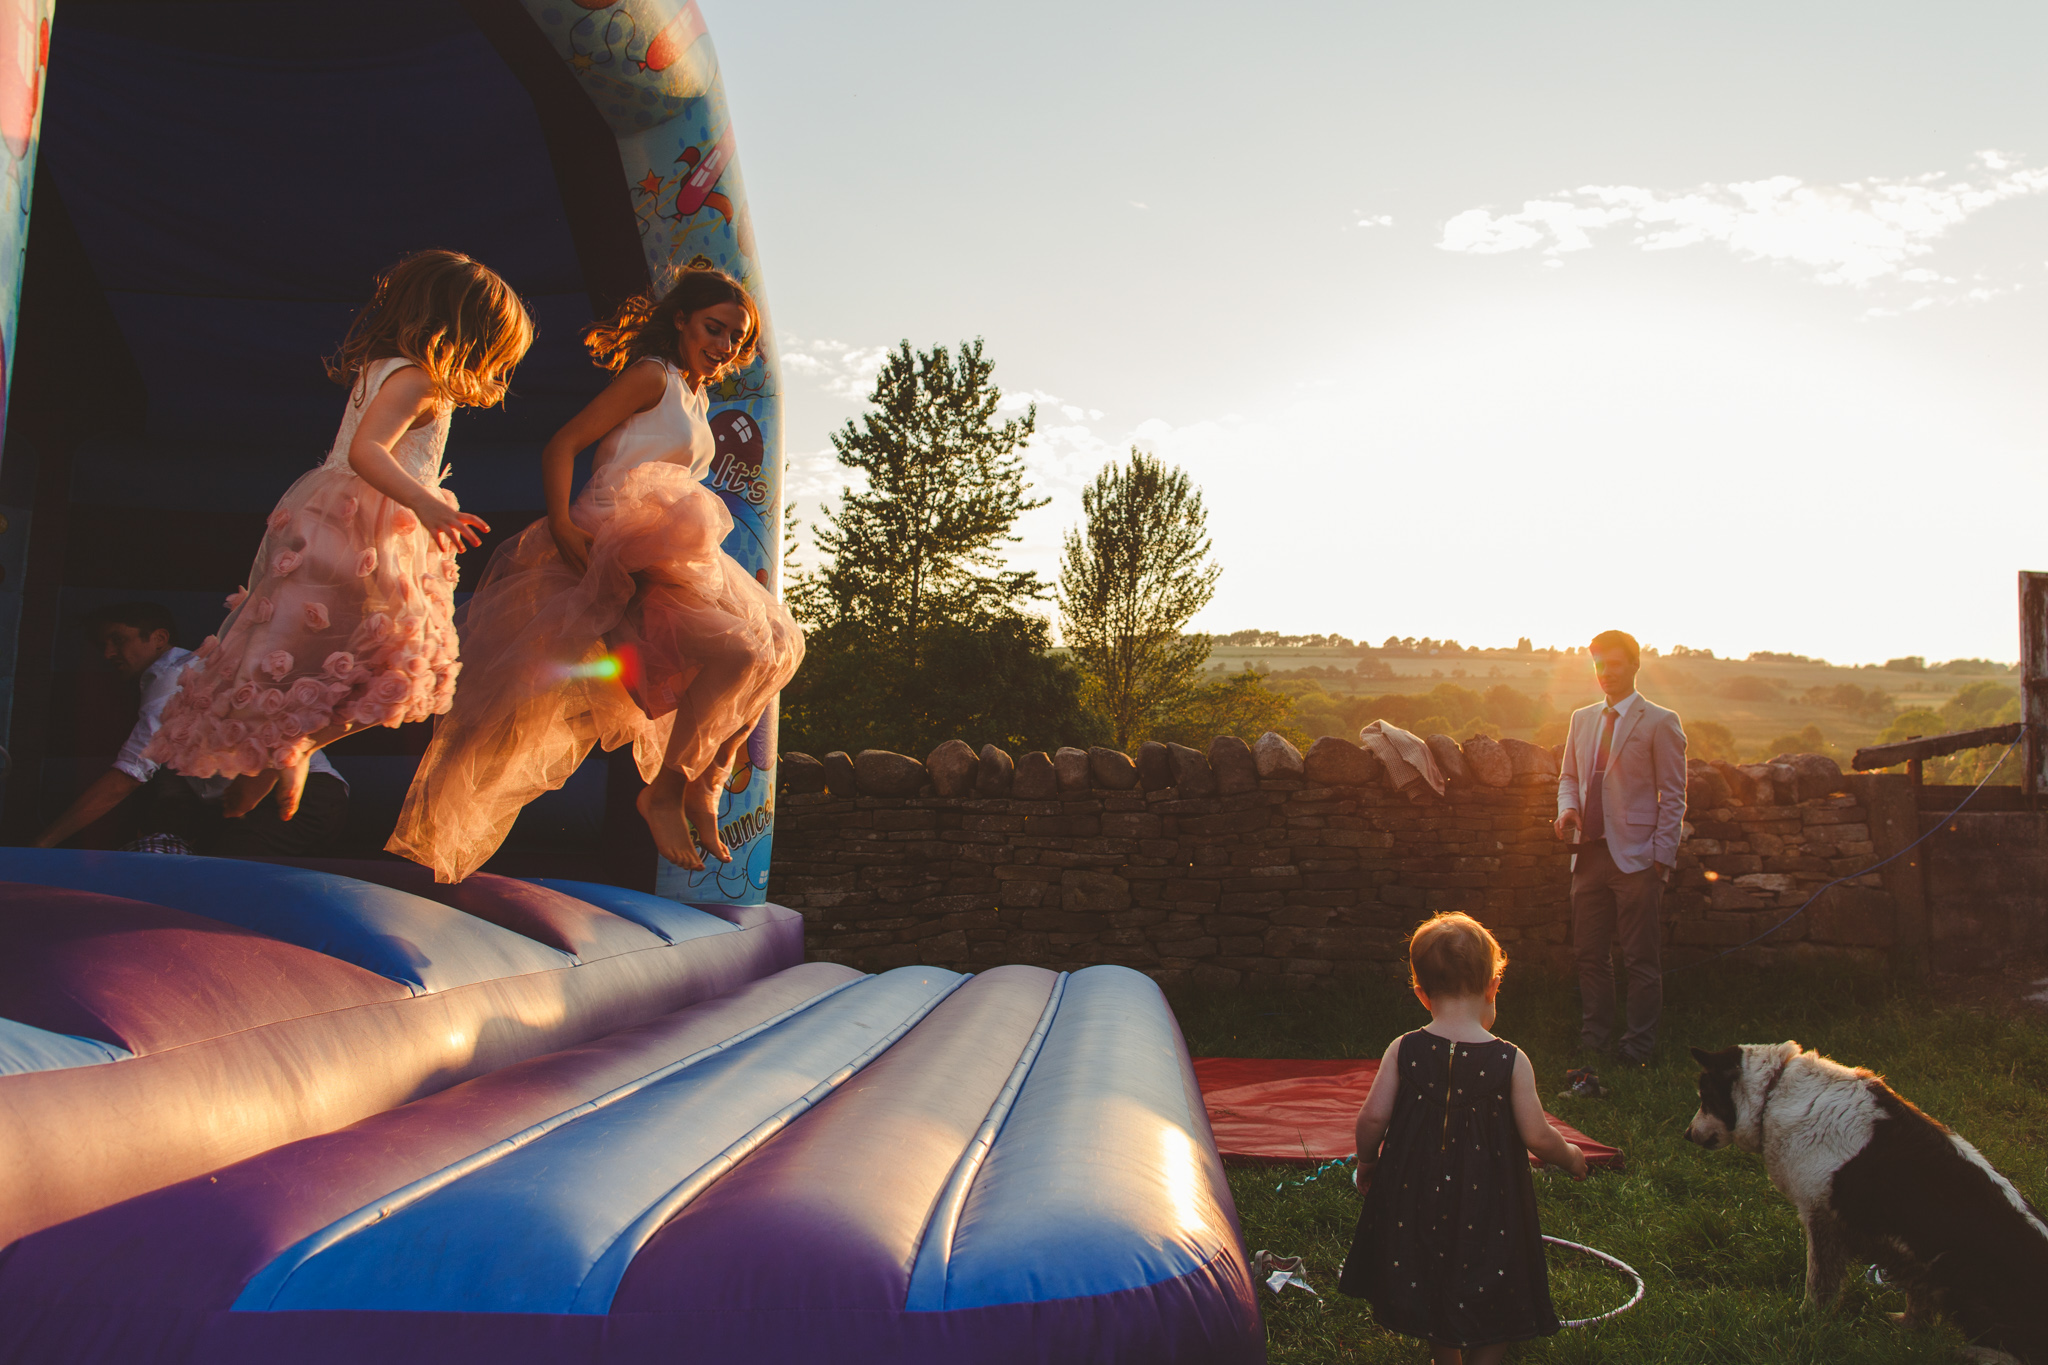 derbyshire-wedding-photographer-videographer-camera-hannah-46.jpg